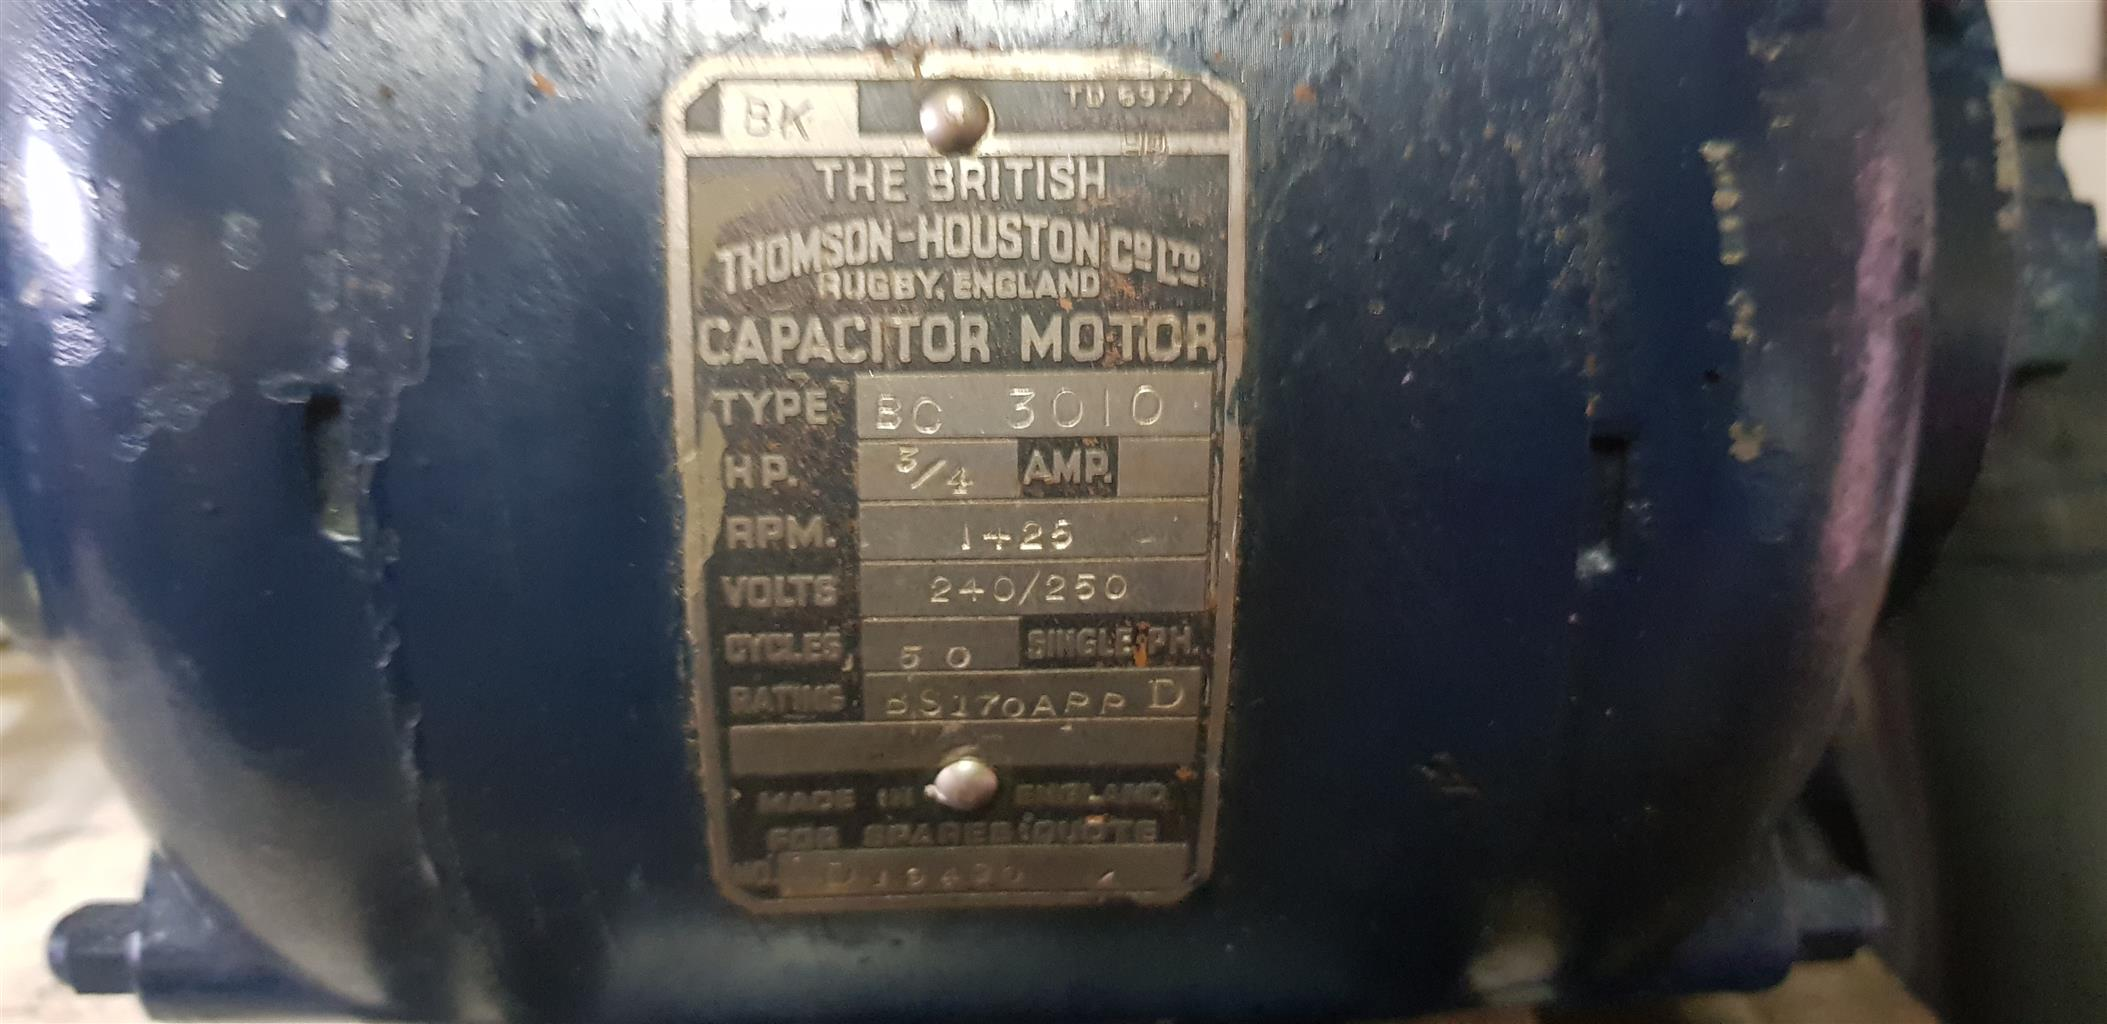 Thomson Houston Capacitor Motor